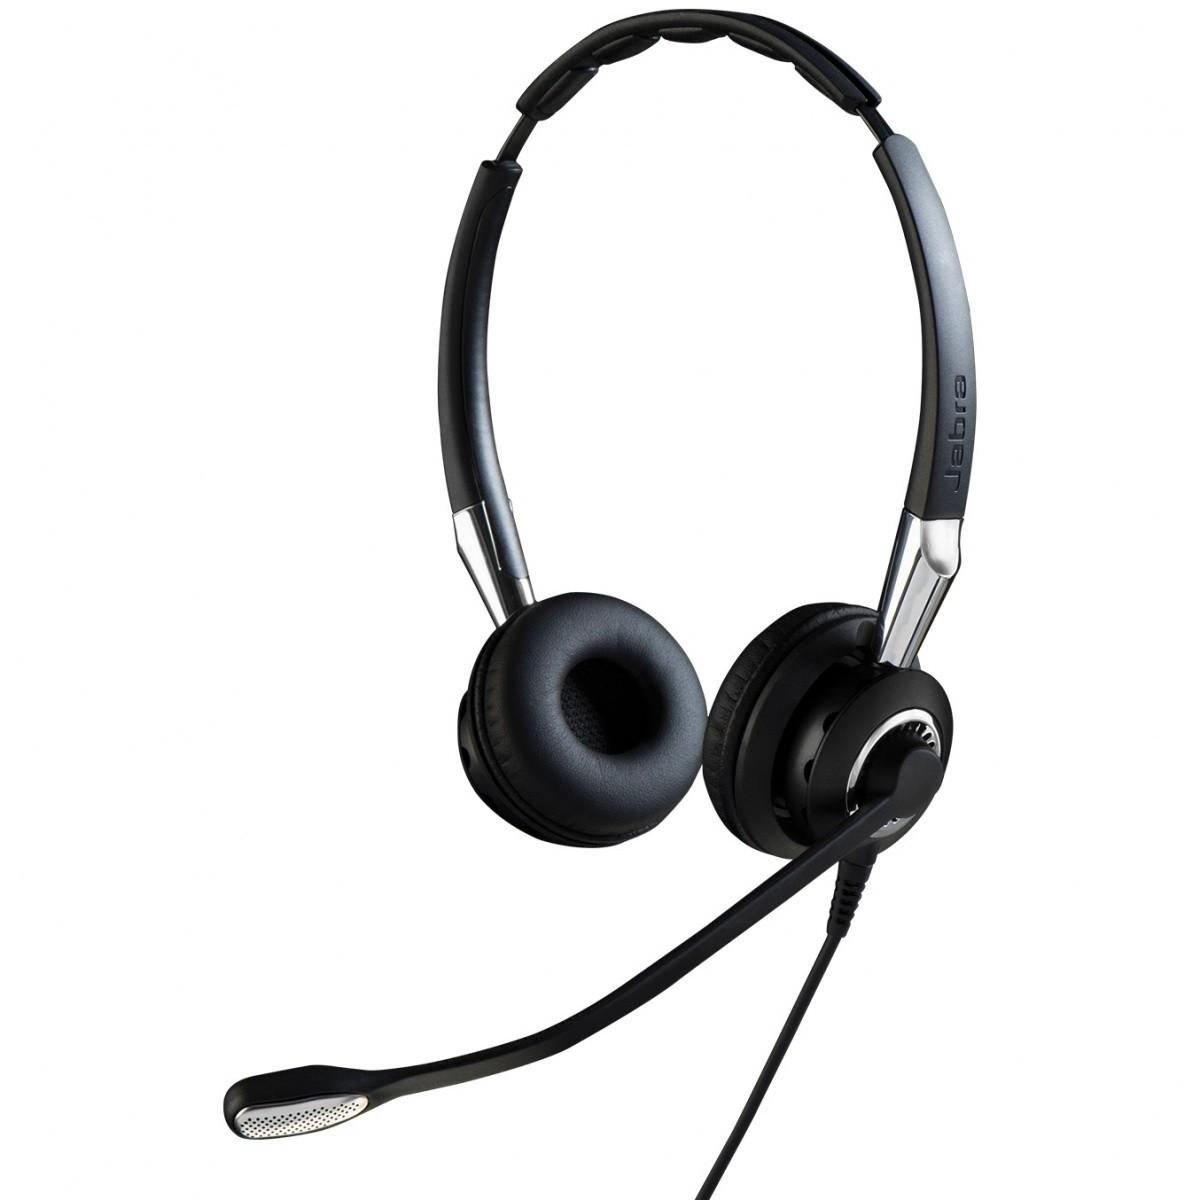 biz2400-2gen-duo-qd-noise-cancelling-unify-full-wideband